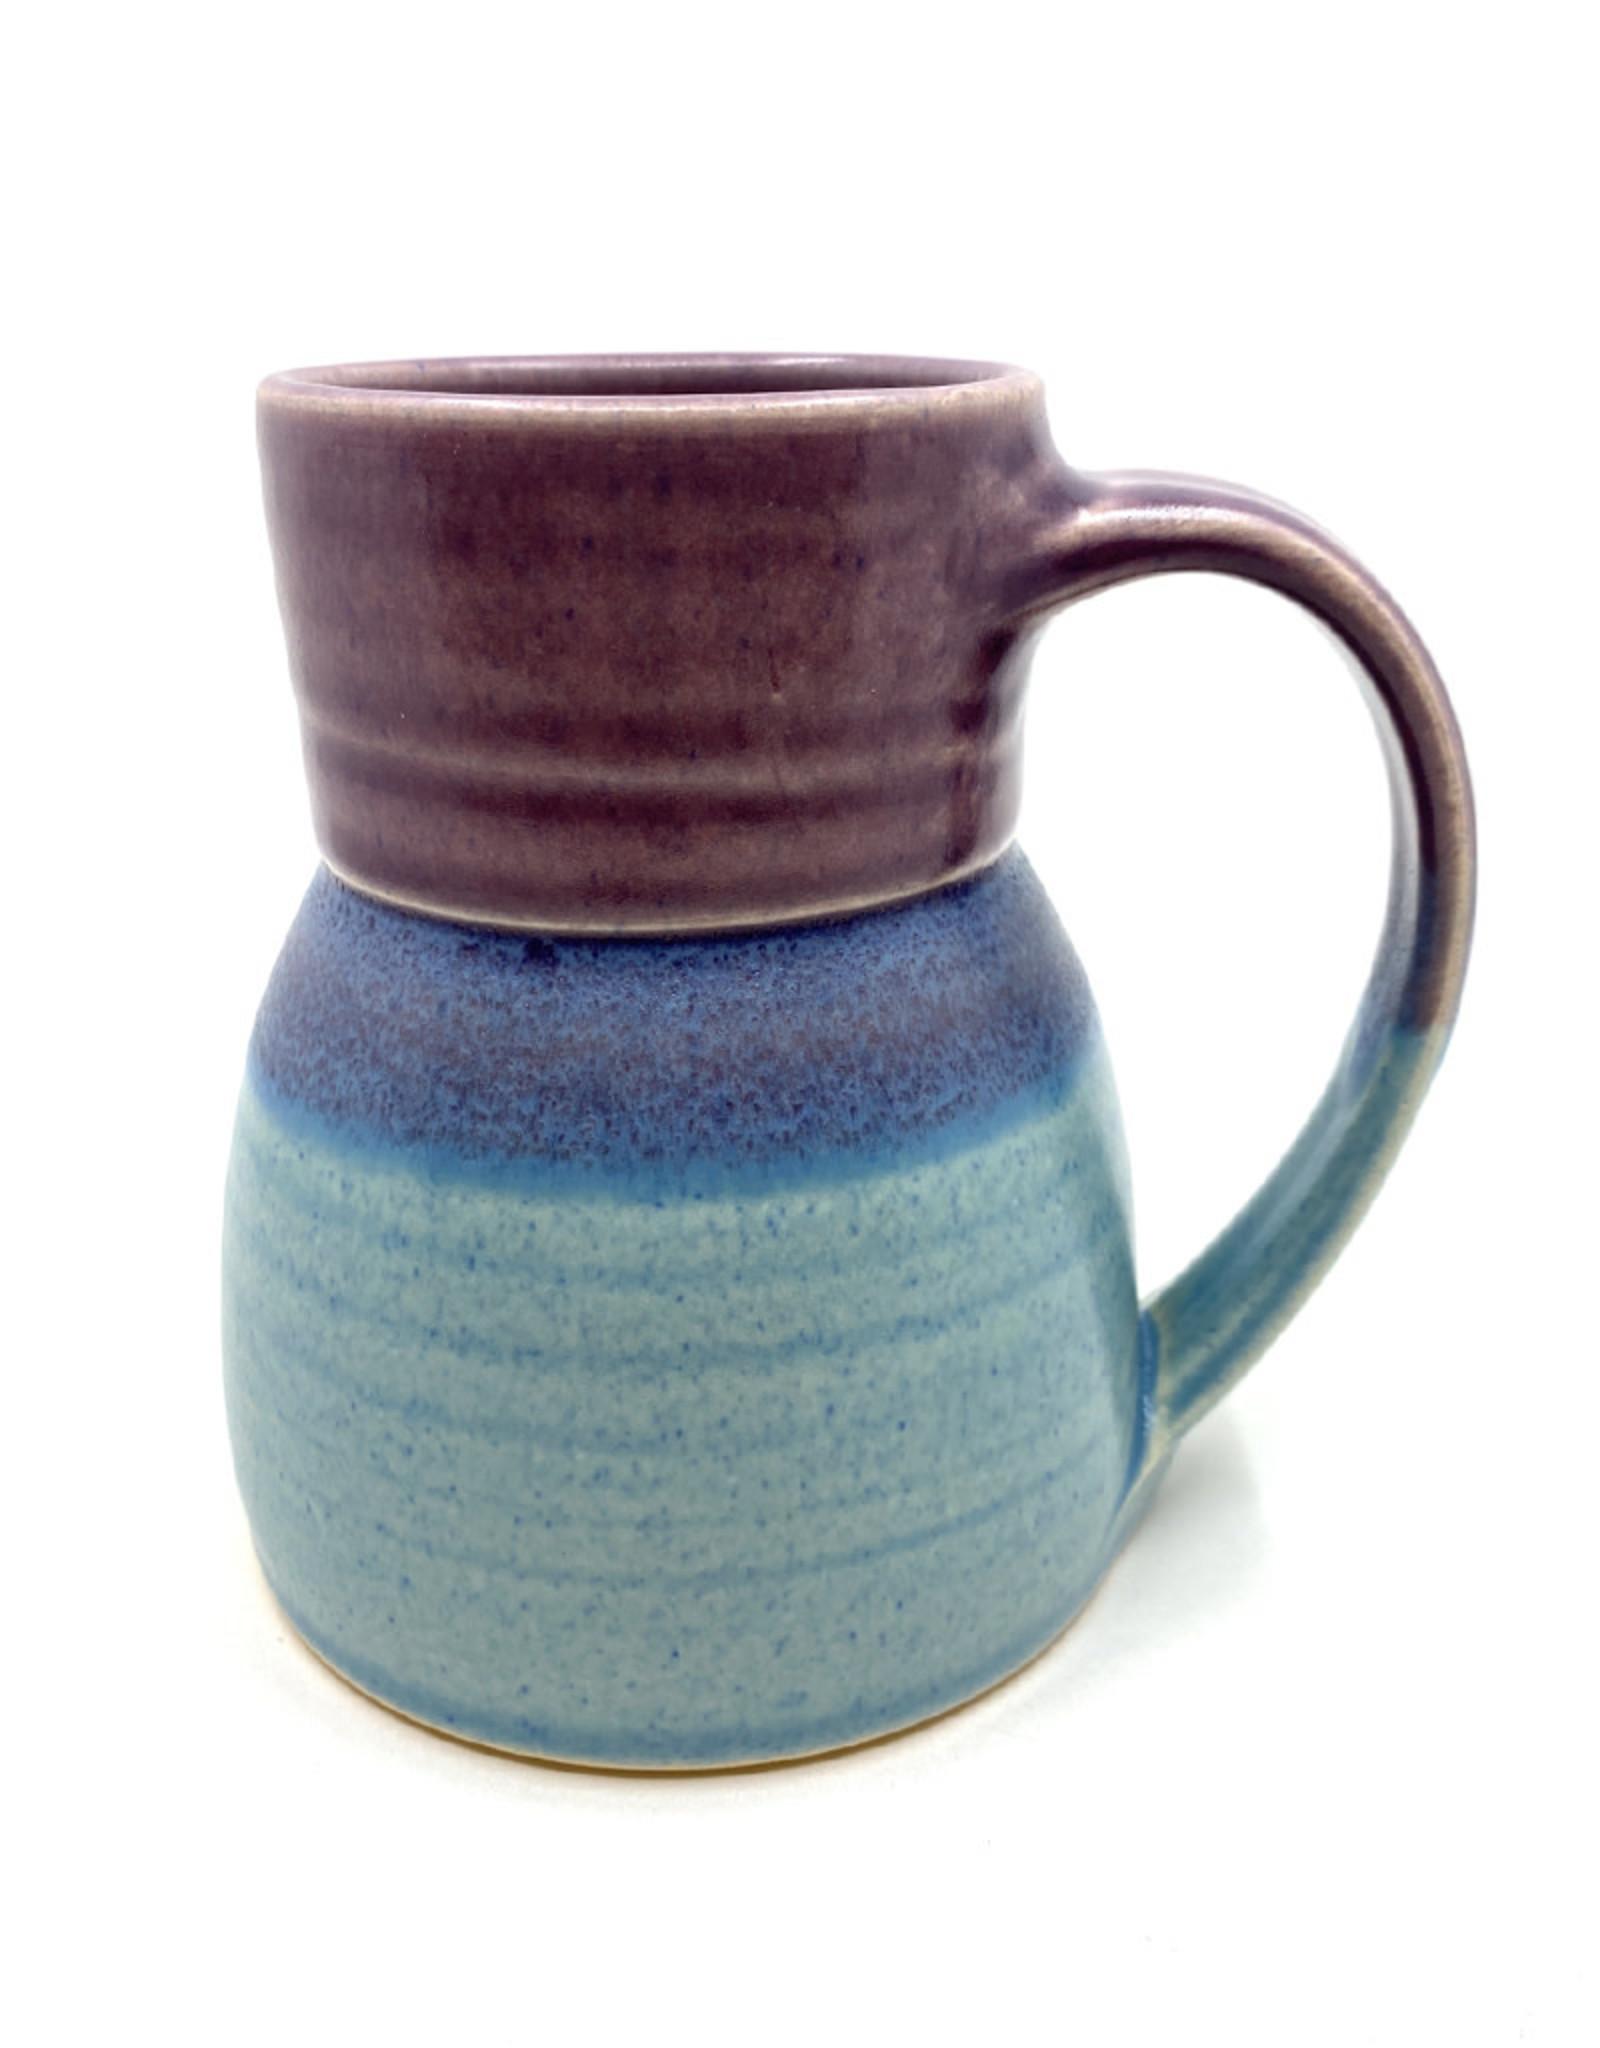 ONE ACRE CERAMICS BOTTLE MUG - PURPLE & LIGHT BLUE